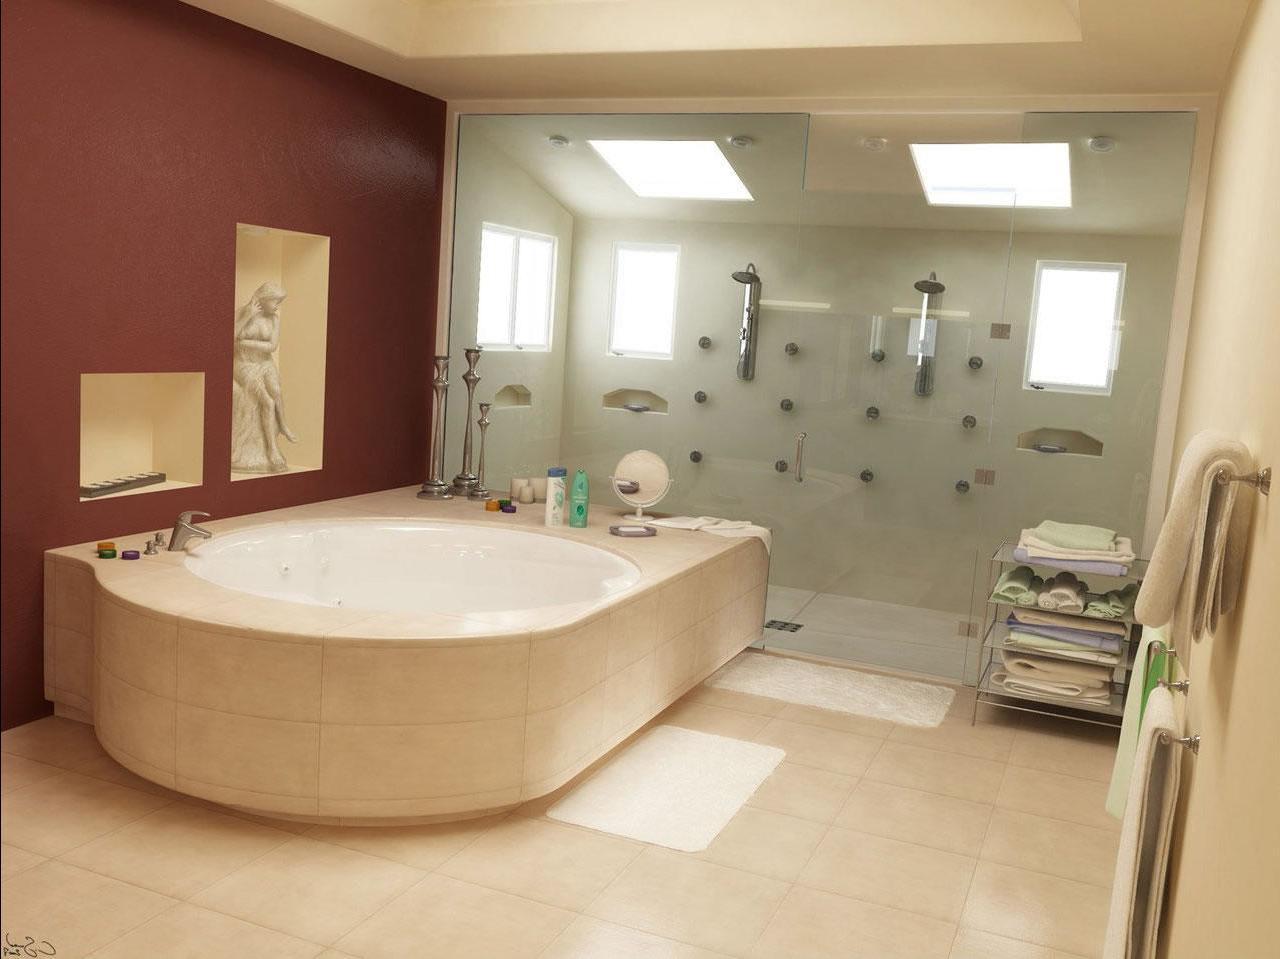 dizayn vannoy komnati v grecheskom stile - Идеи и советы для ремонта в ванной комнате